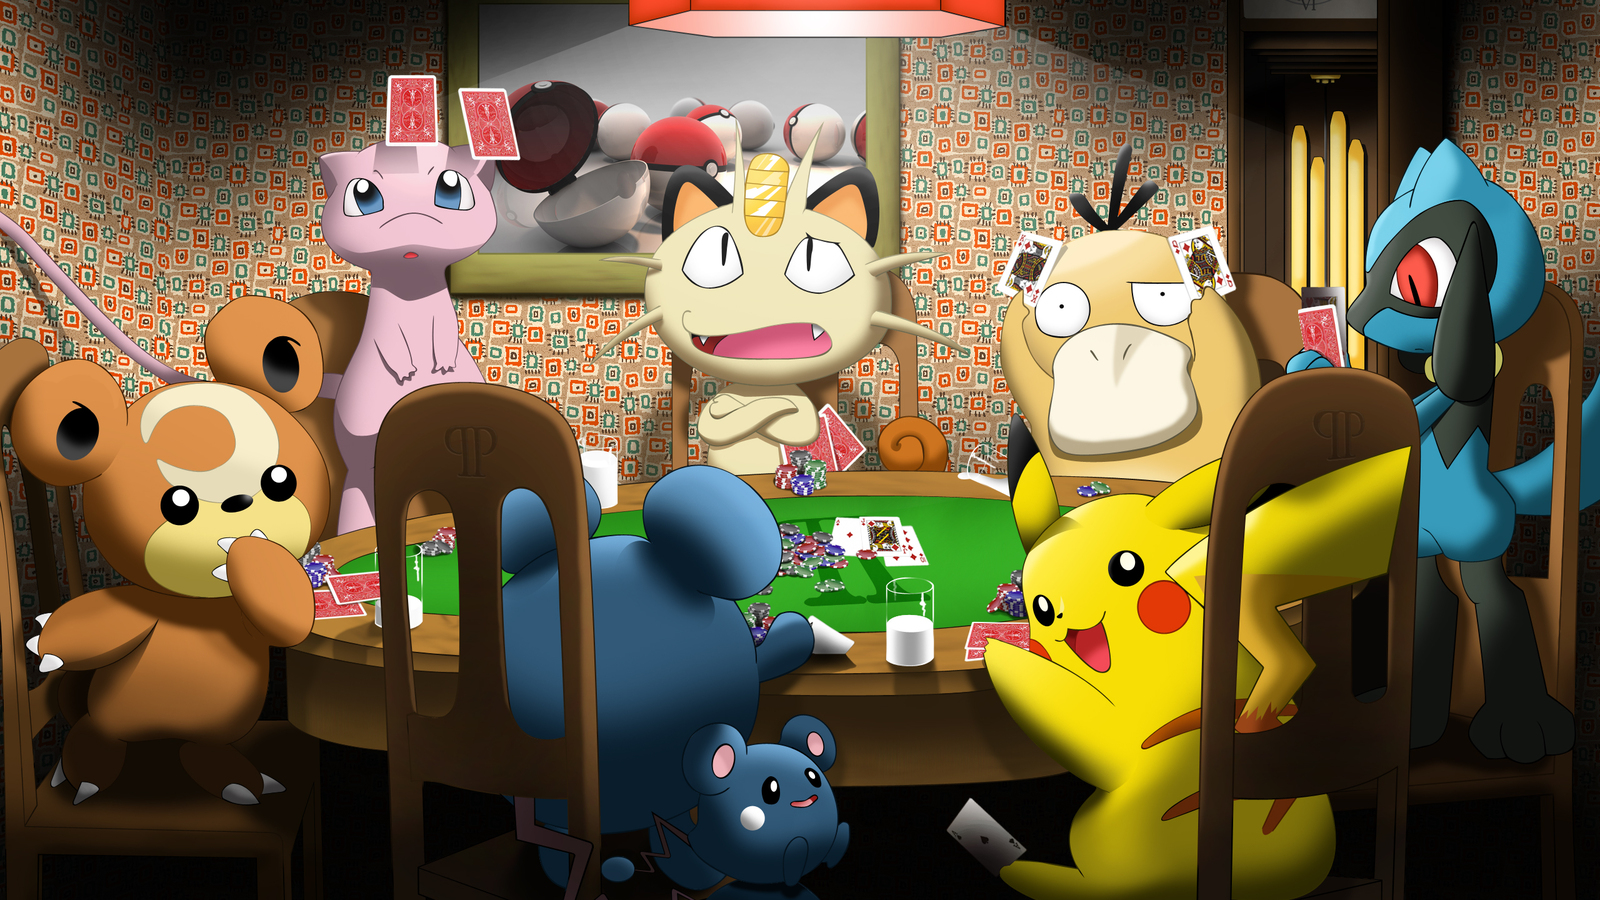 Download Pokemon Wallpaper 1600x900 Full HD Wallpapers 1600x900